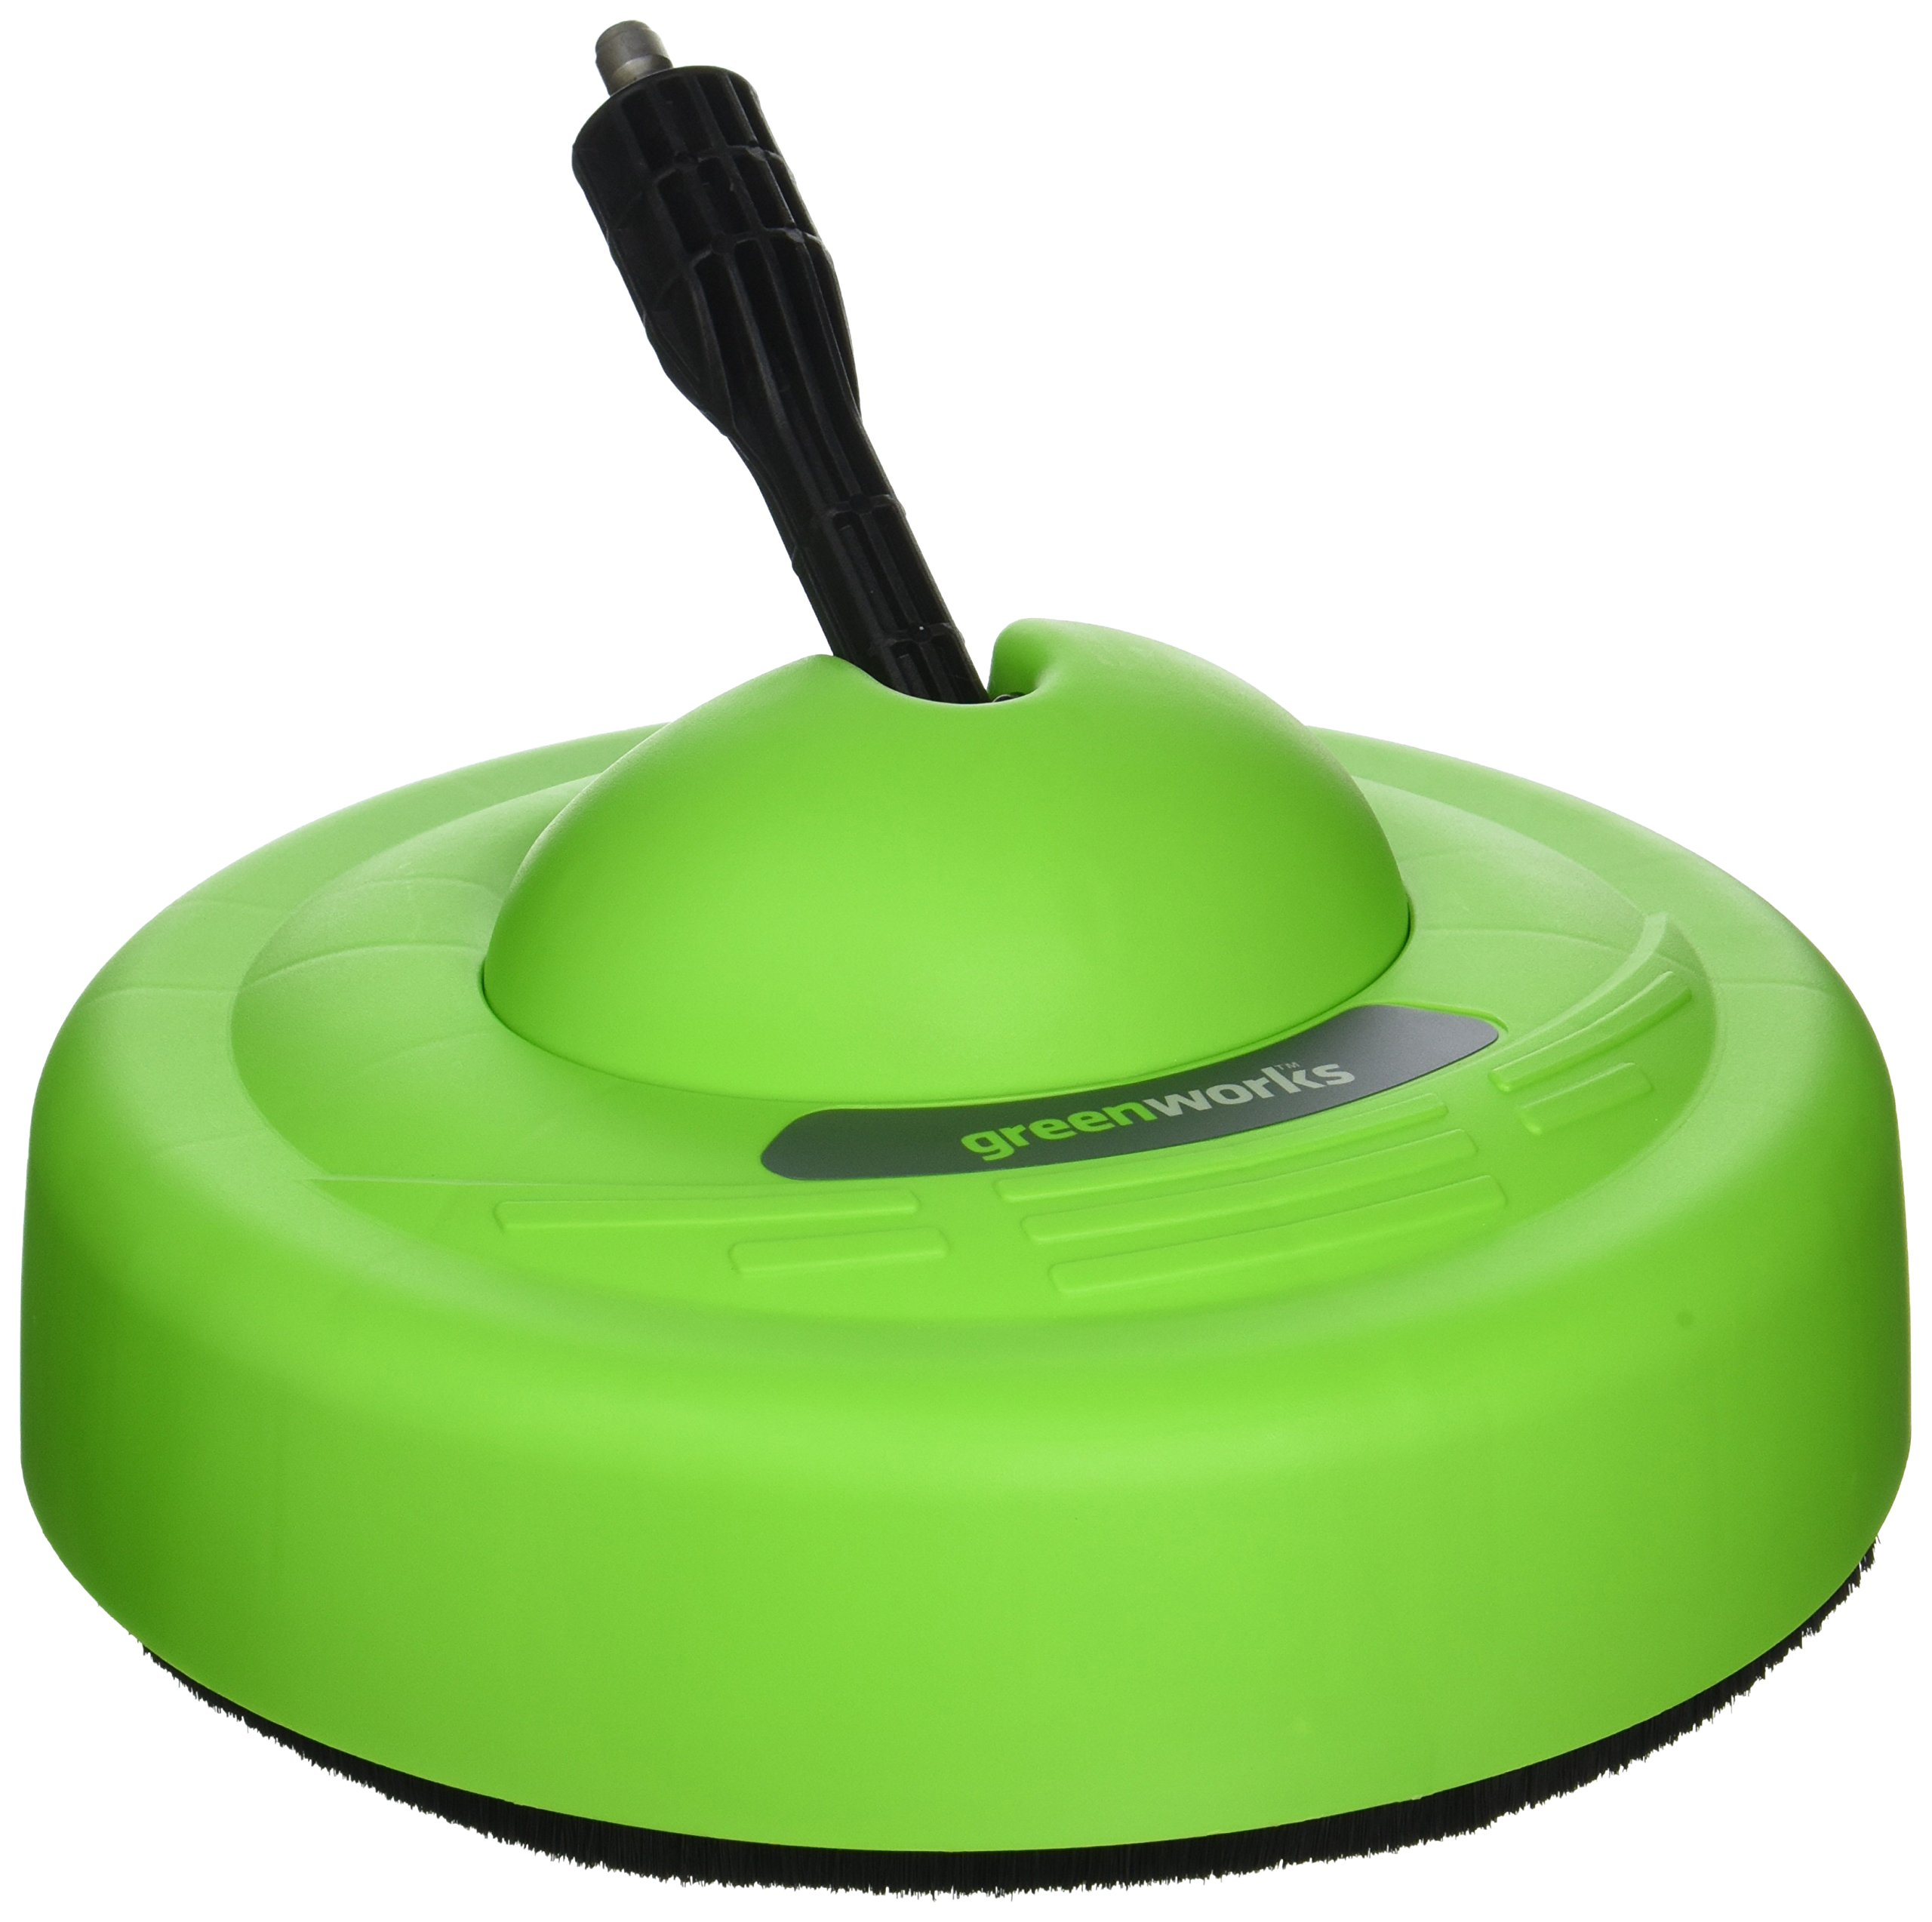 Greenworks Surface Cleaner Universal Pressure Washer Attachment 30012 by Greenworks